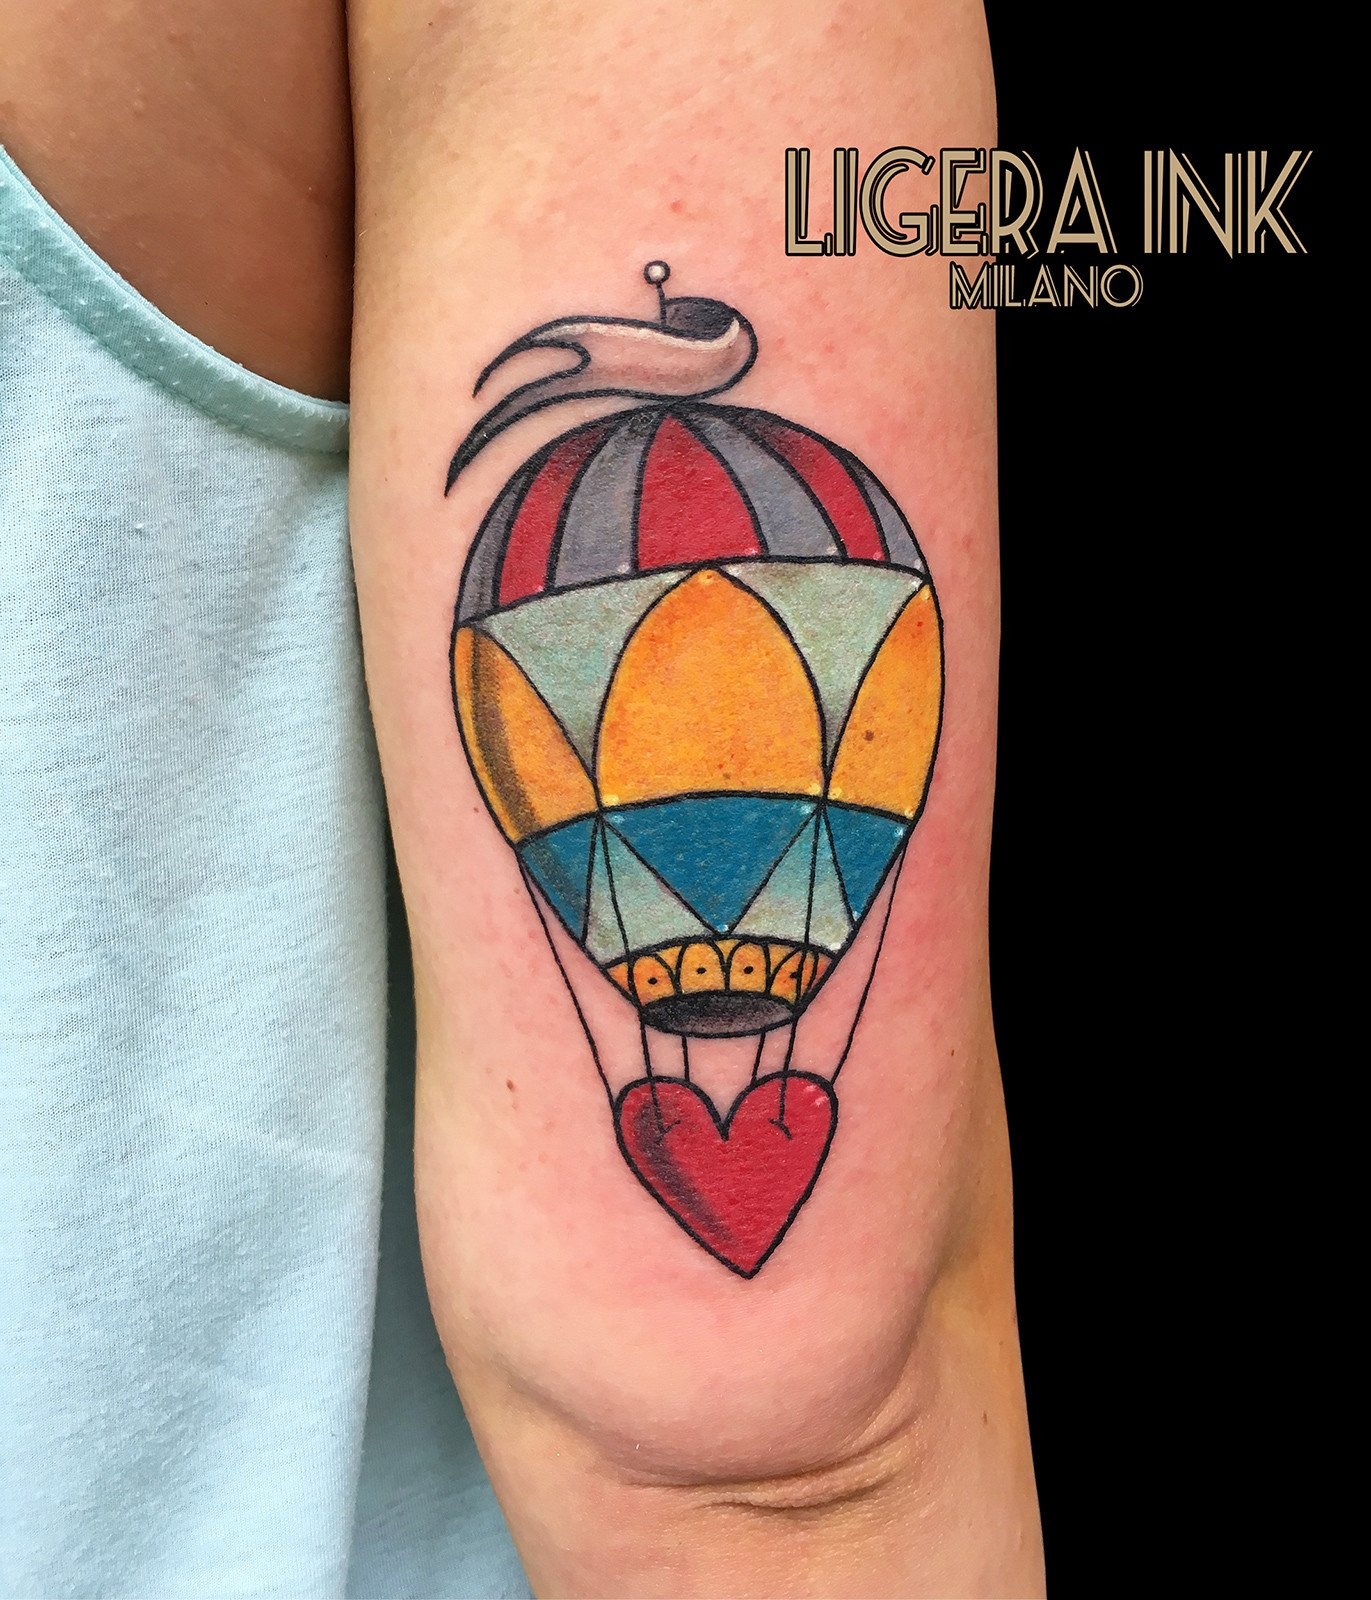 Ligera-ink-tatuaggio-mongolfiera-tattoo-mongolfiera-tatuaggio-milano-tattoo-milano